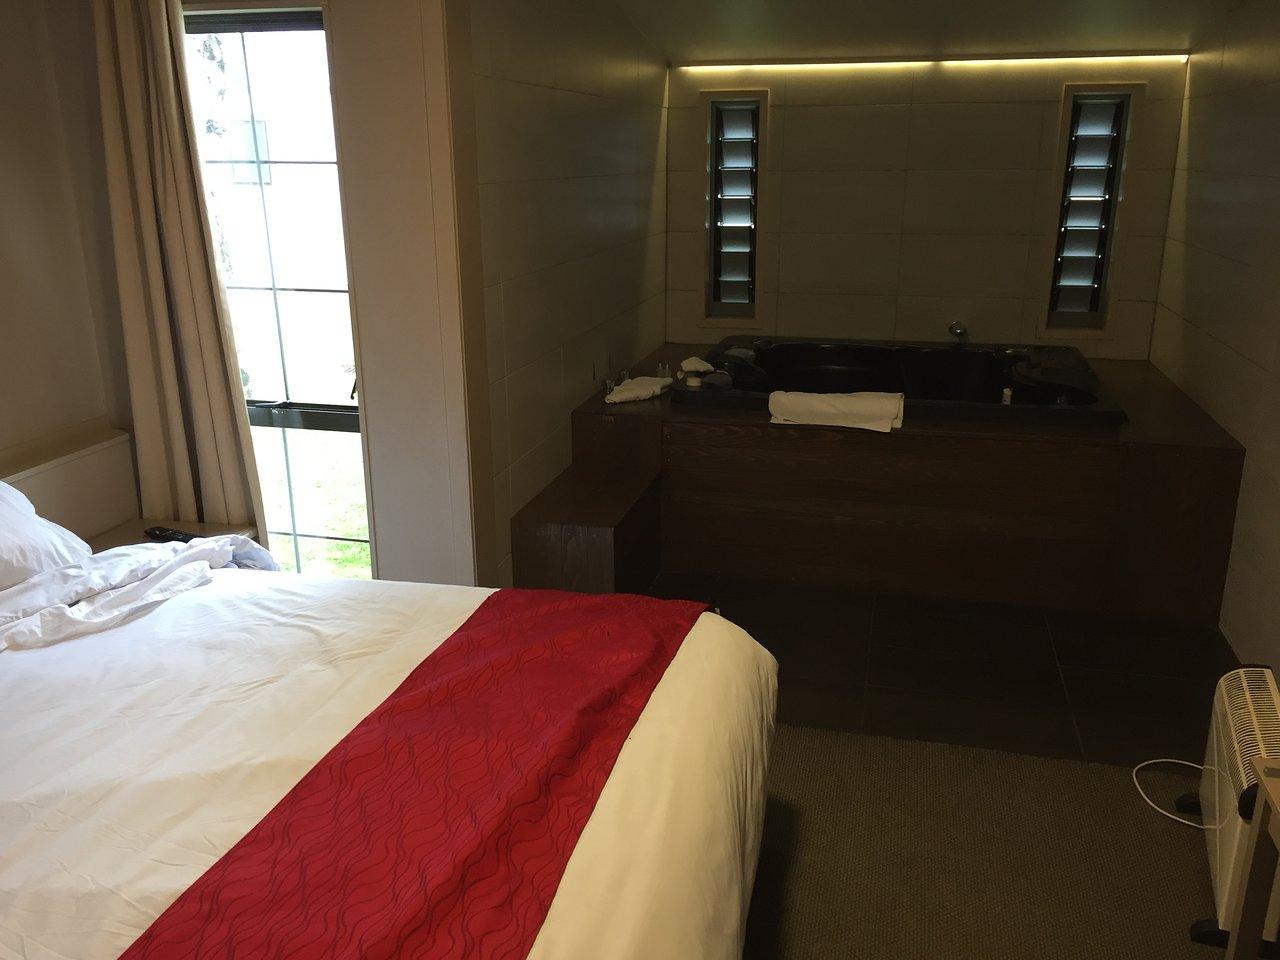 aspen manor motel updated 2019 hotel reviews price comparison rh tripadvisor ie